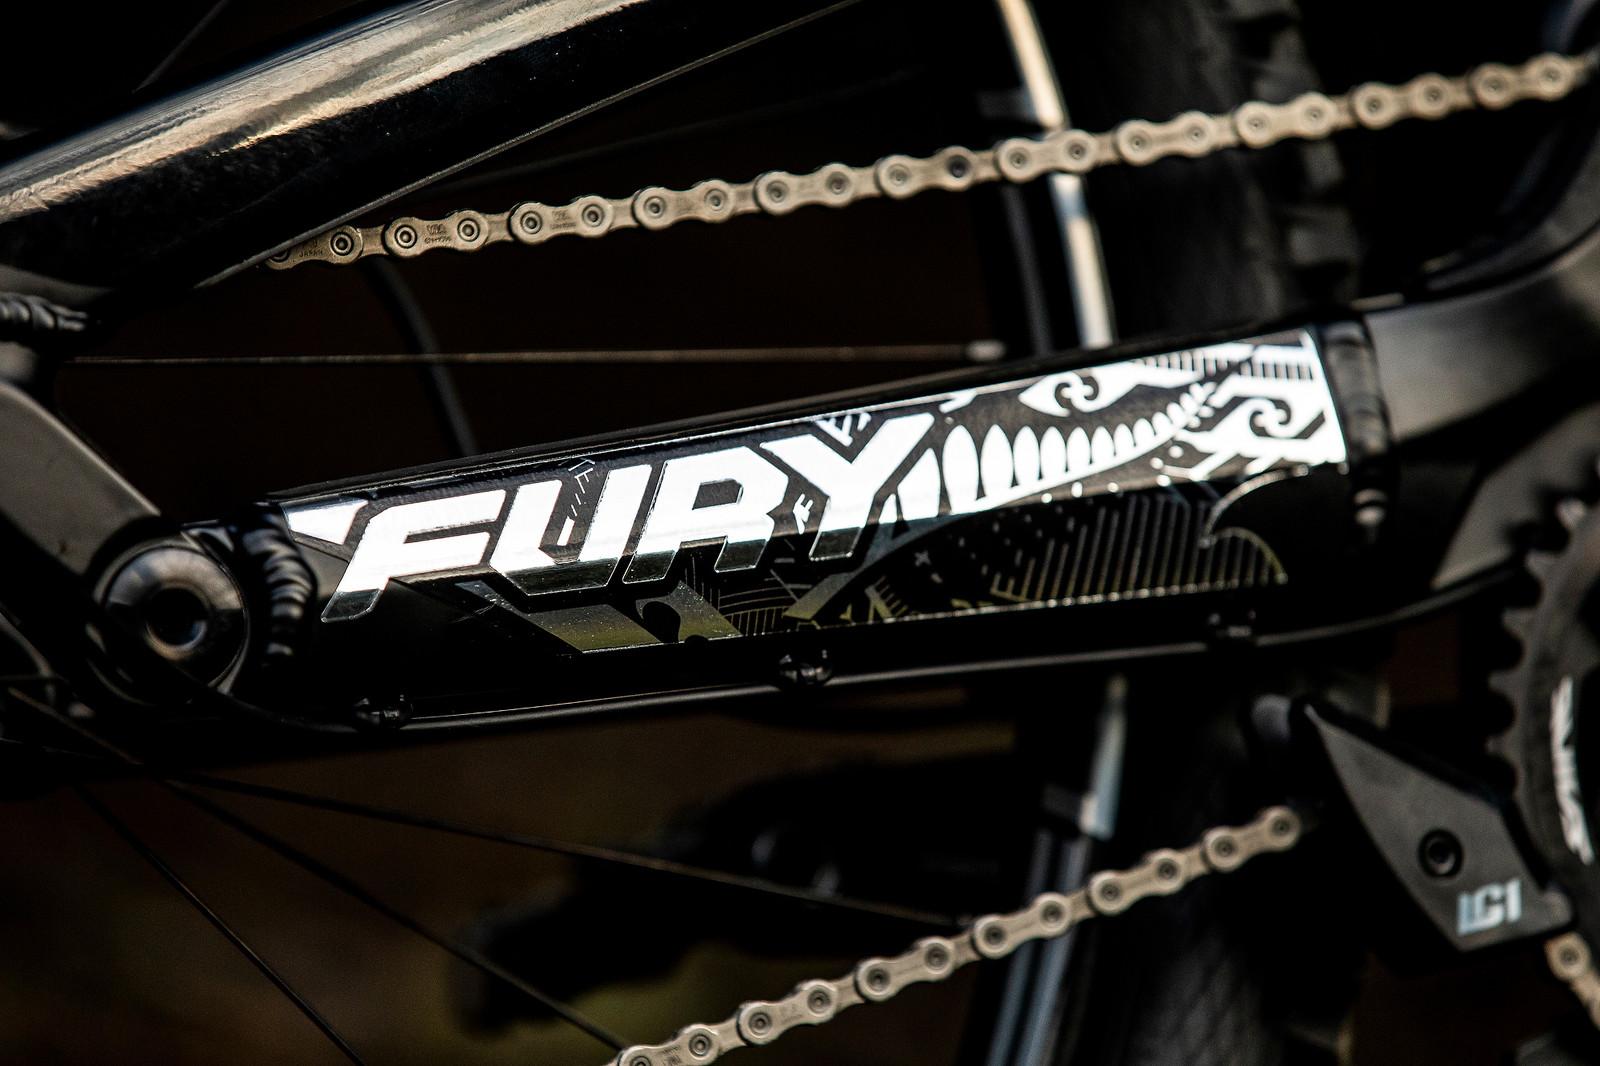 Flight of Fury - WORLD CHAMPS BIKE - Wyn Masters' GT Fury - Mountain Biking Pictures - Vital MTB